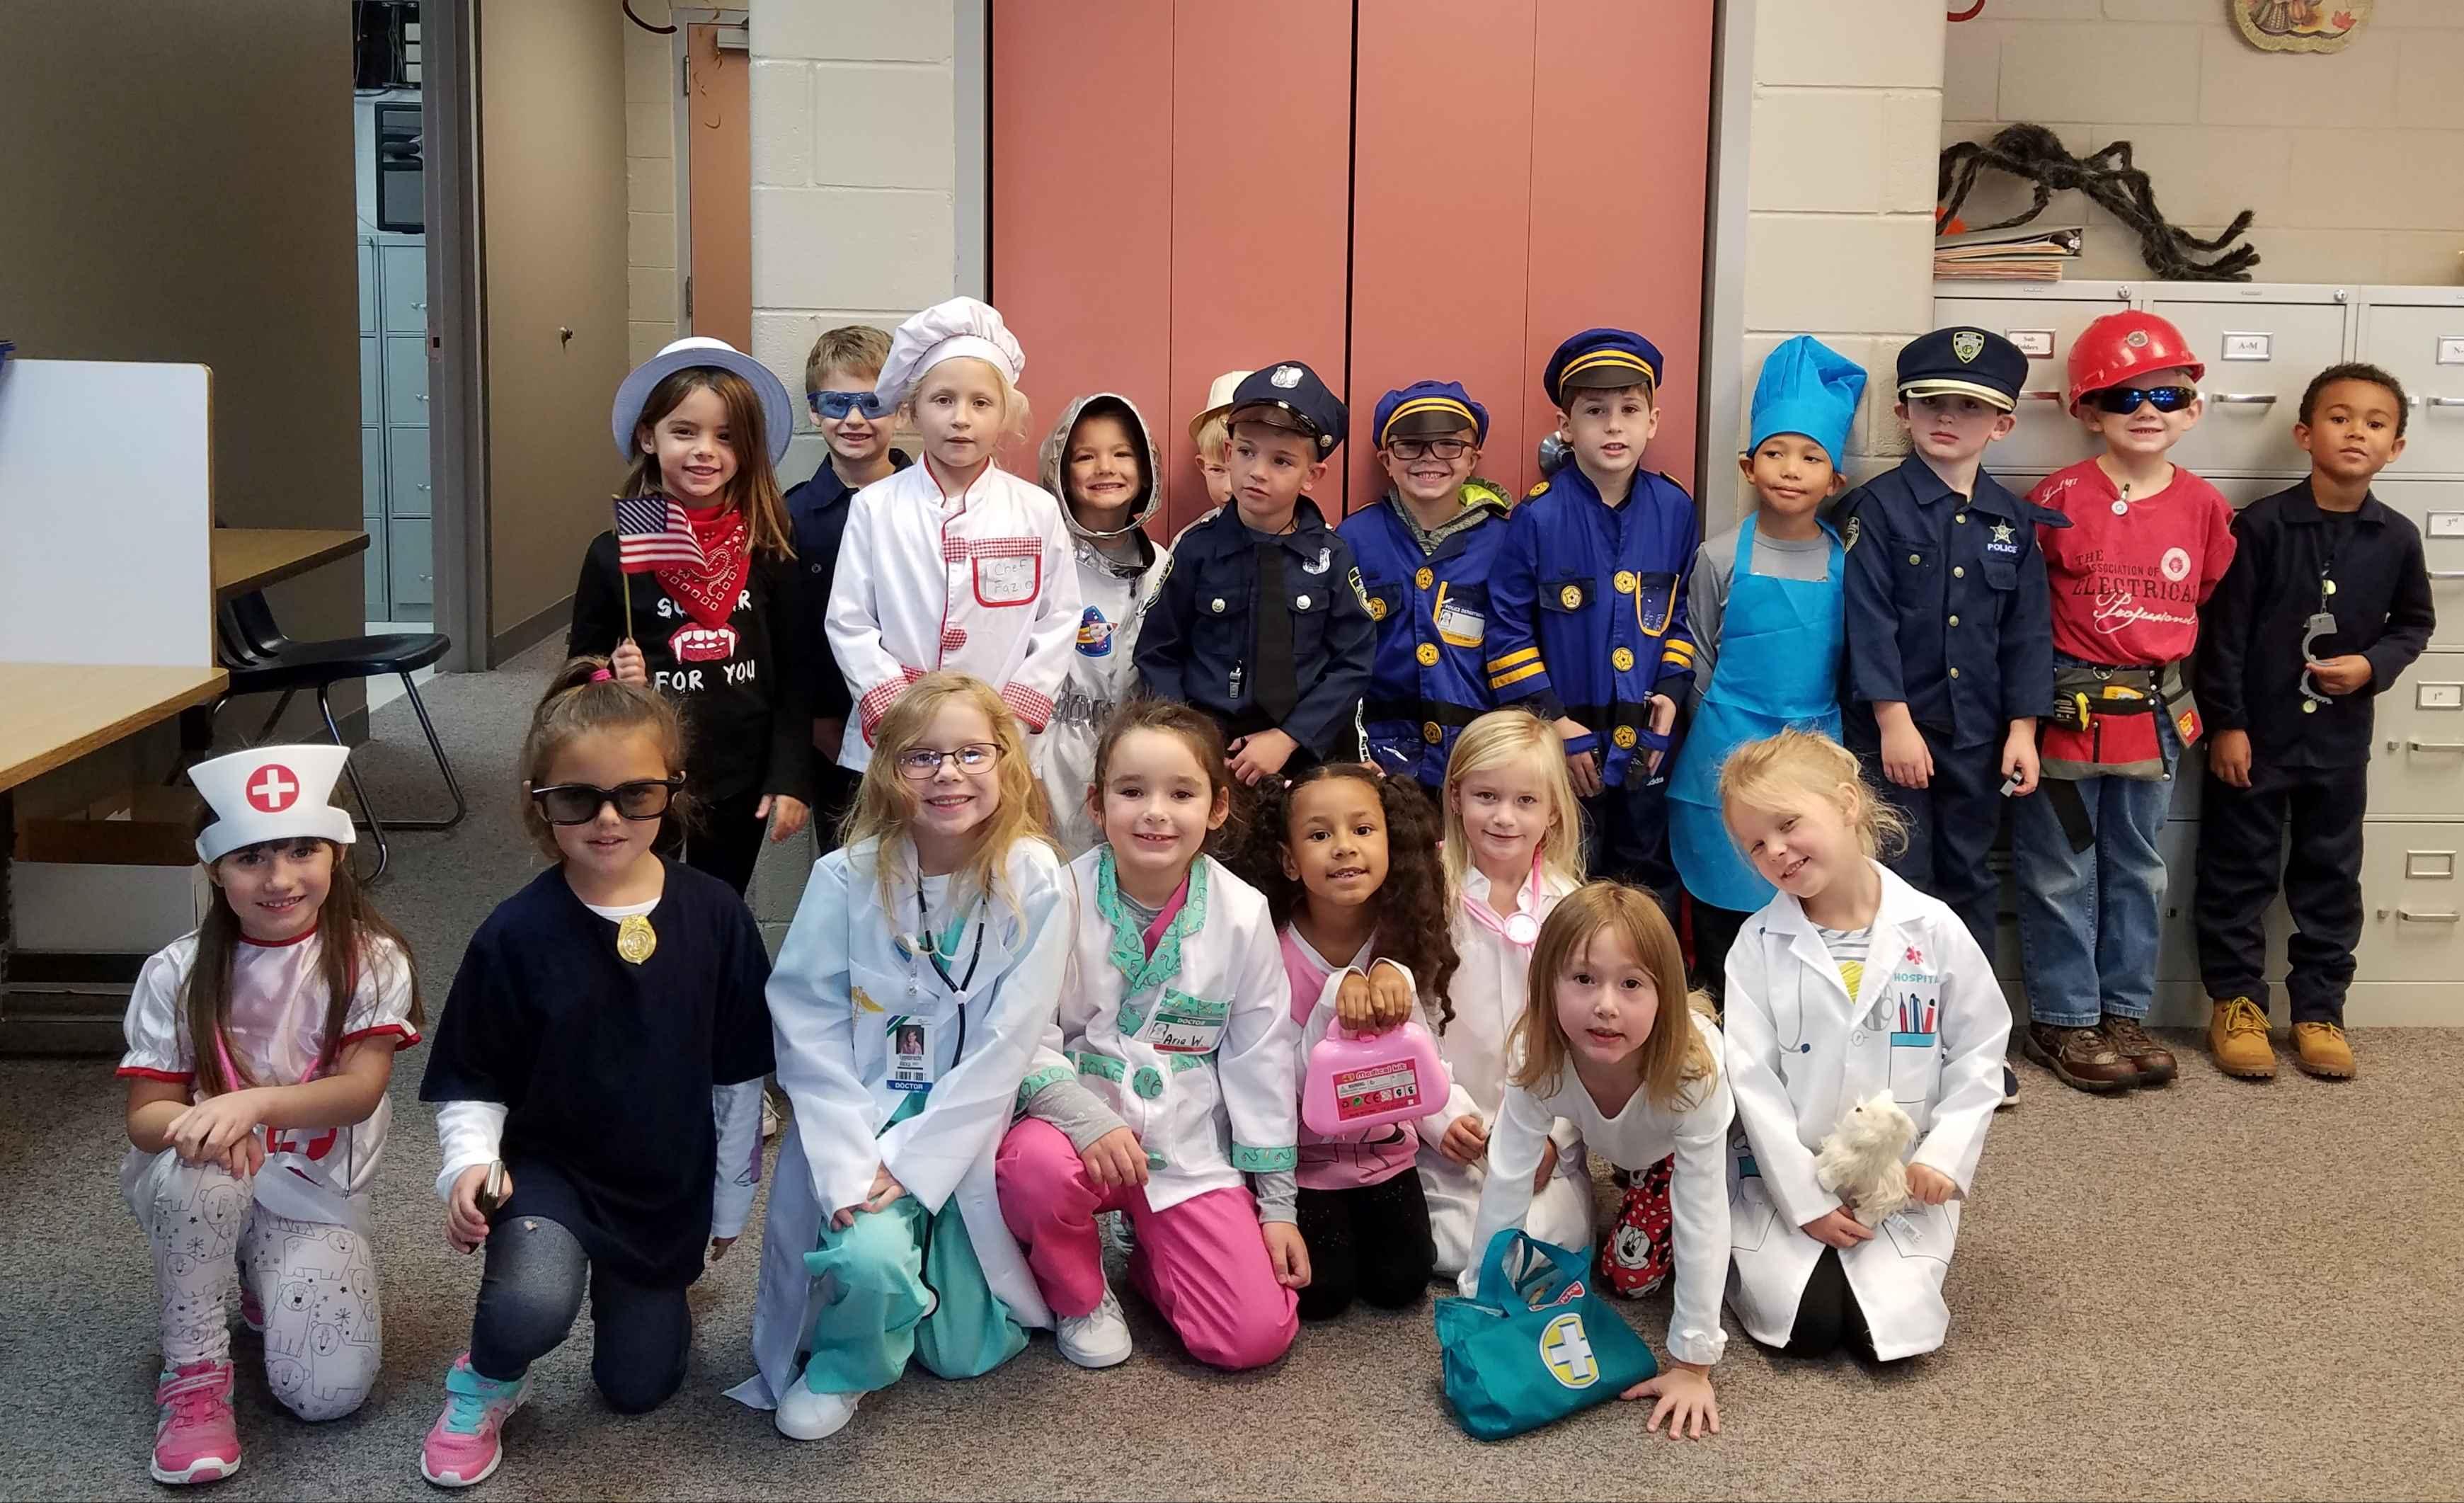 Mrs. Waechter's kindergarten class celebrates Community Helpers